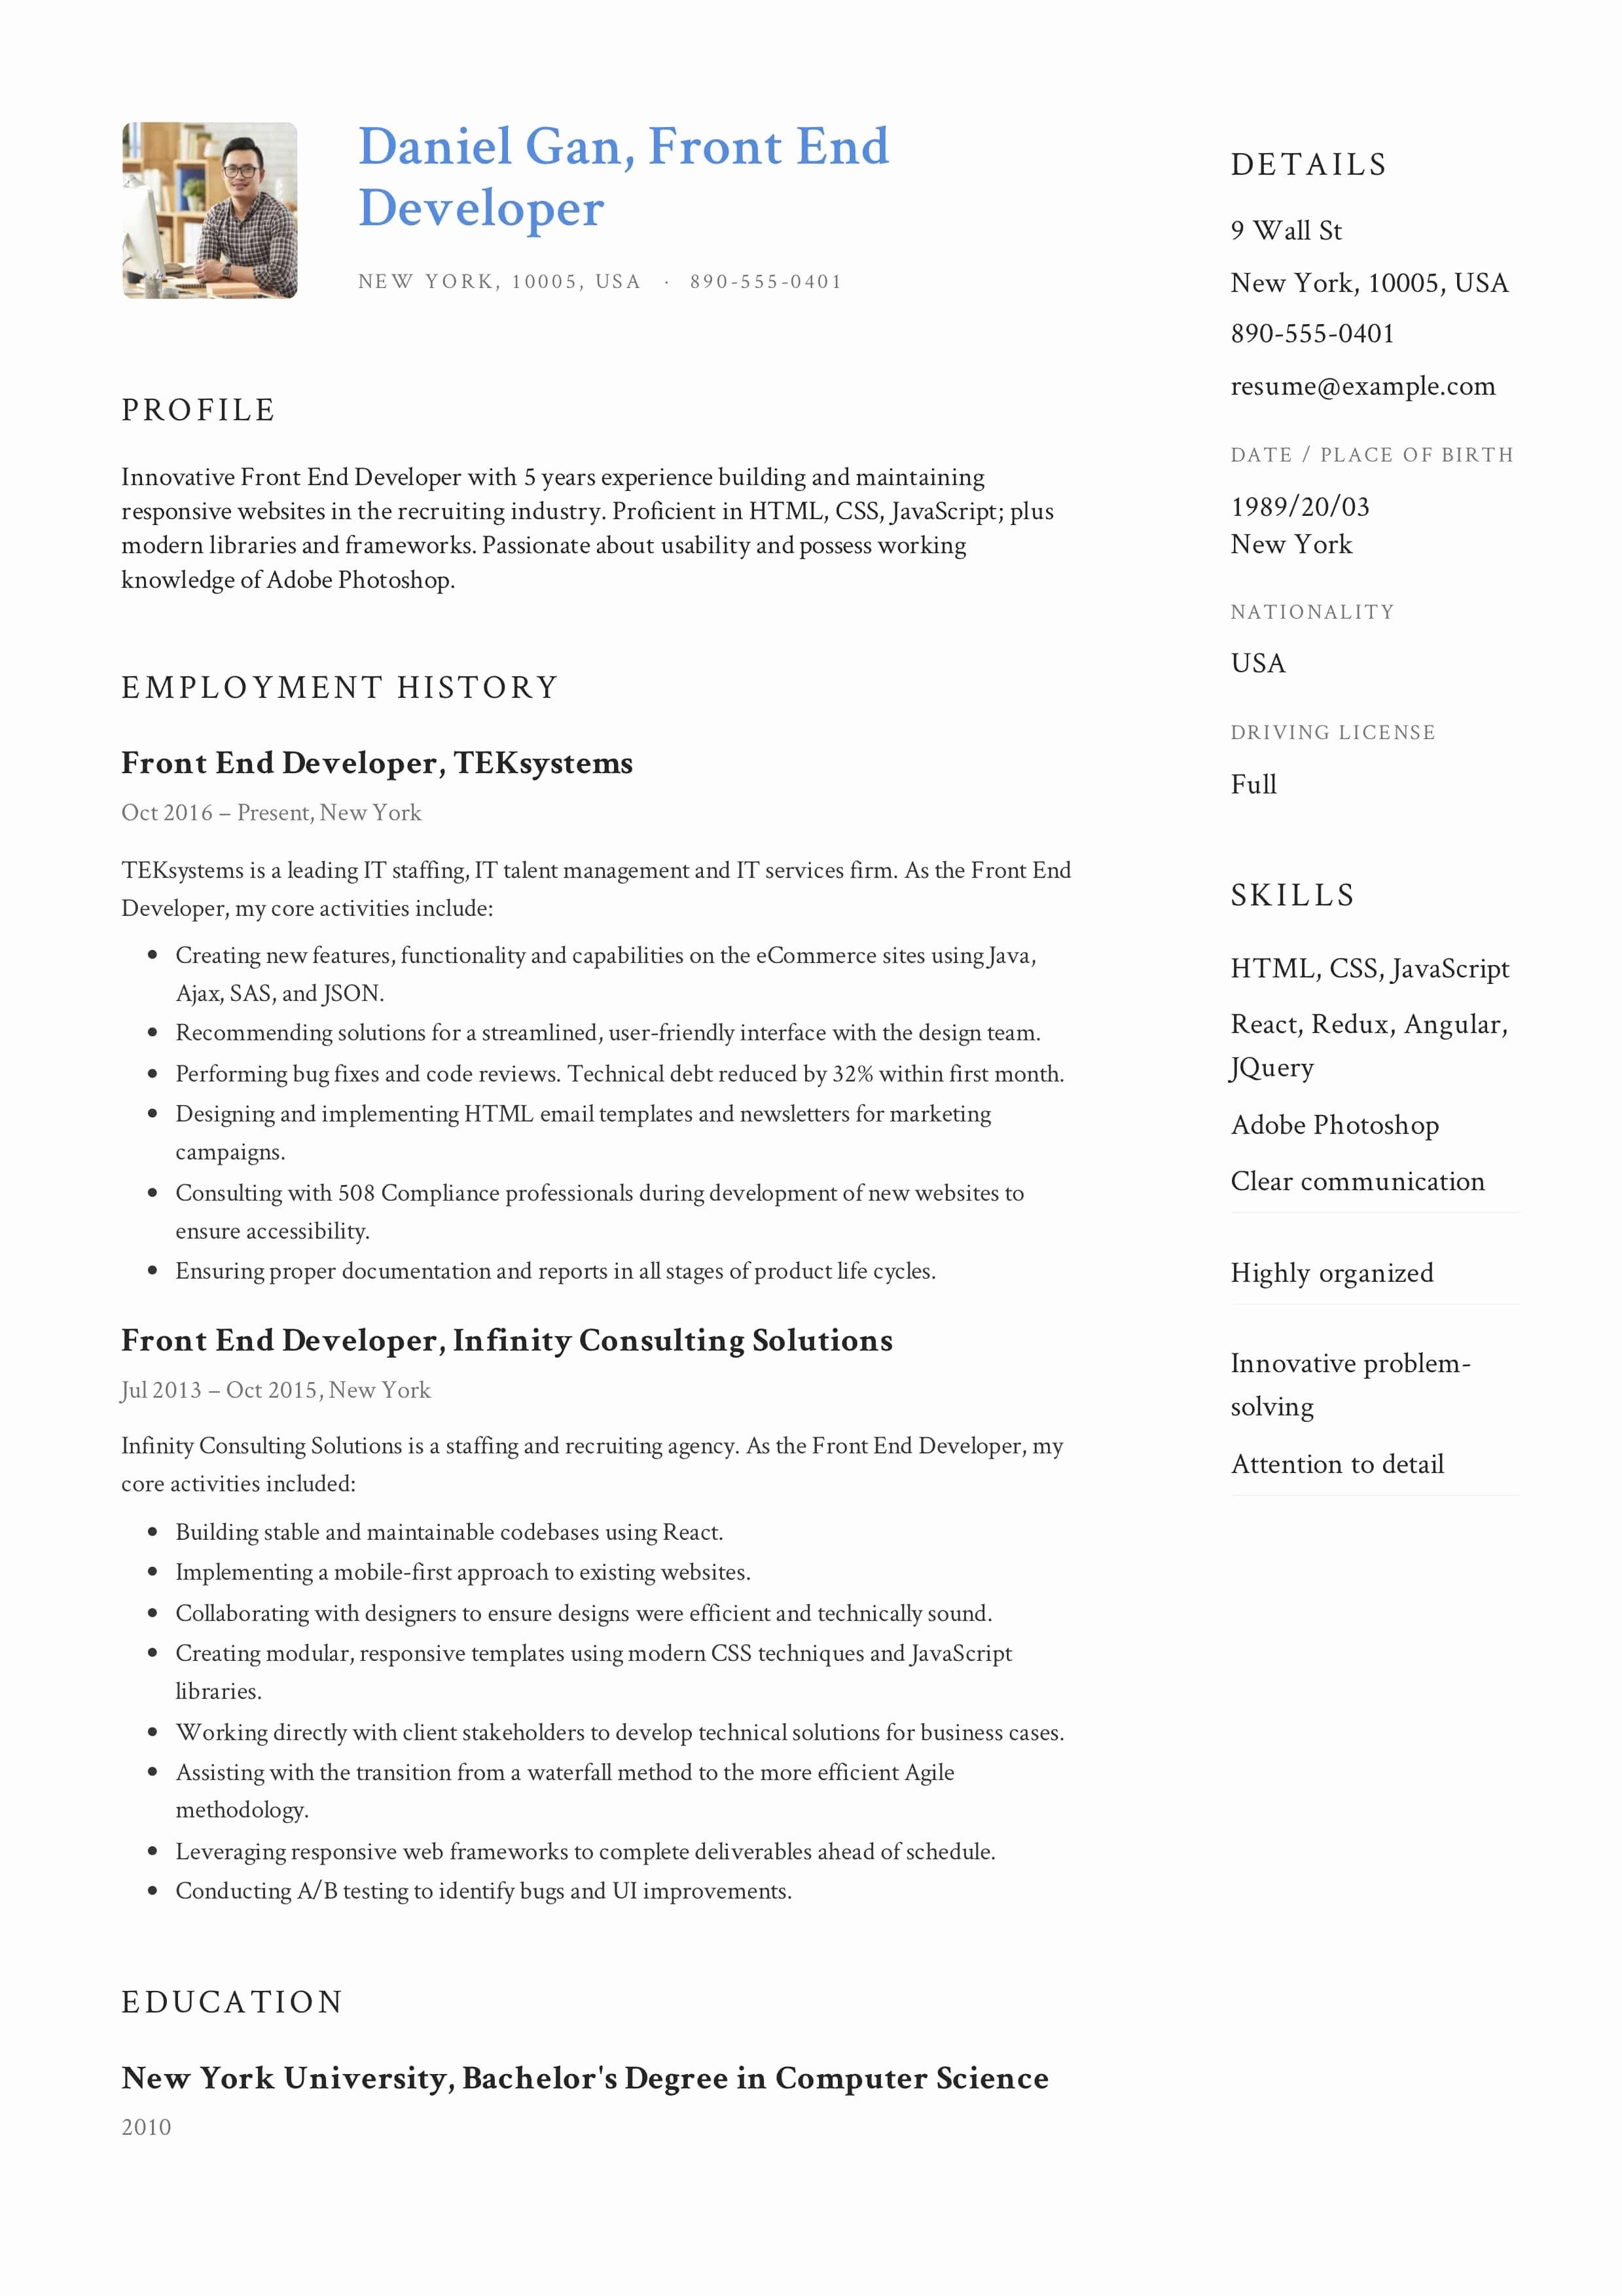 Front End Developer Resume Template Best Of Guide Front End Developer Resume [ 12 Samples ]